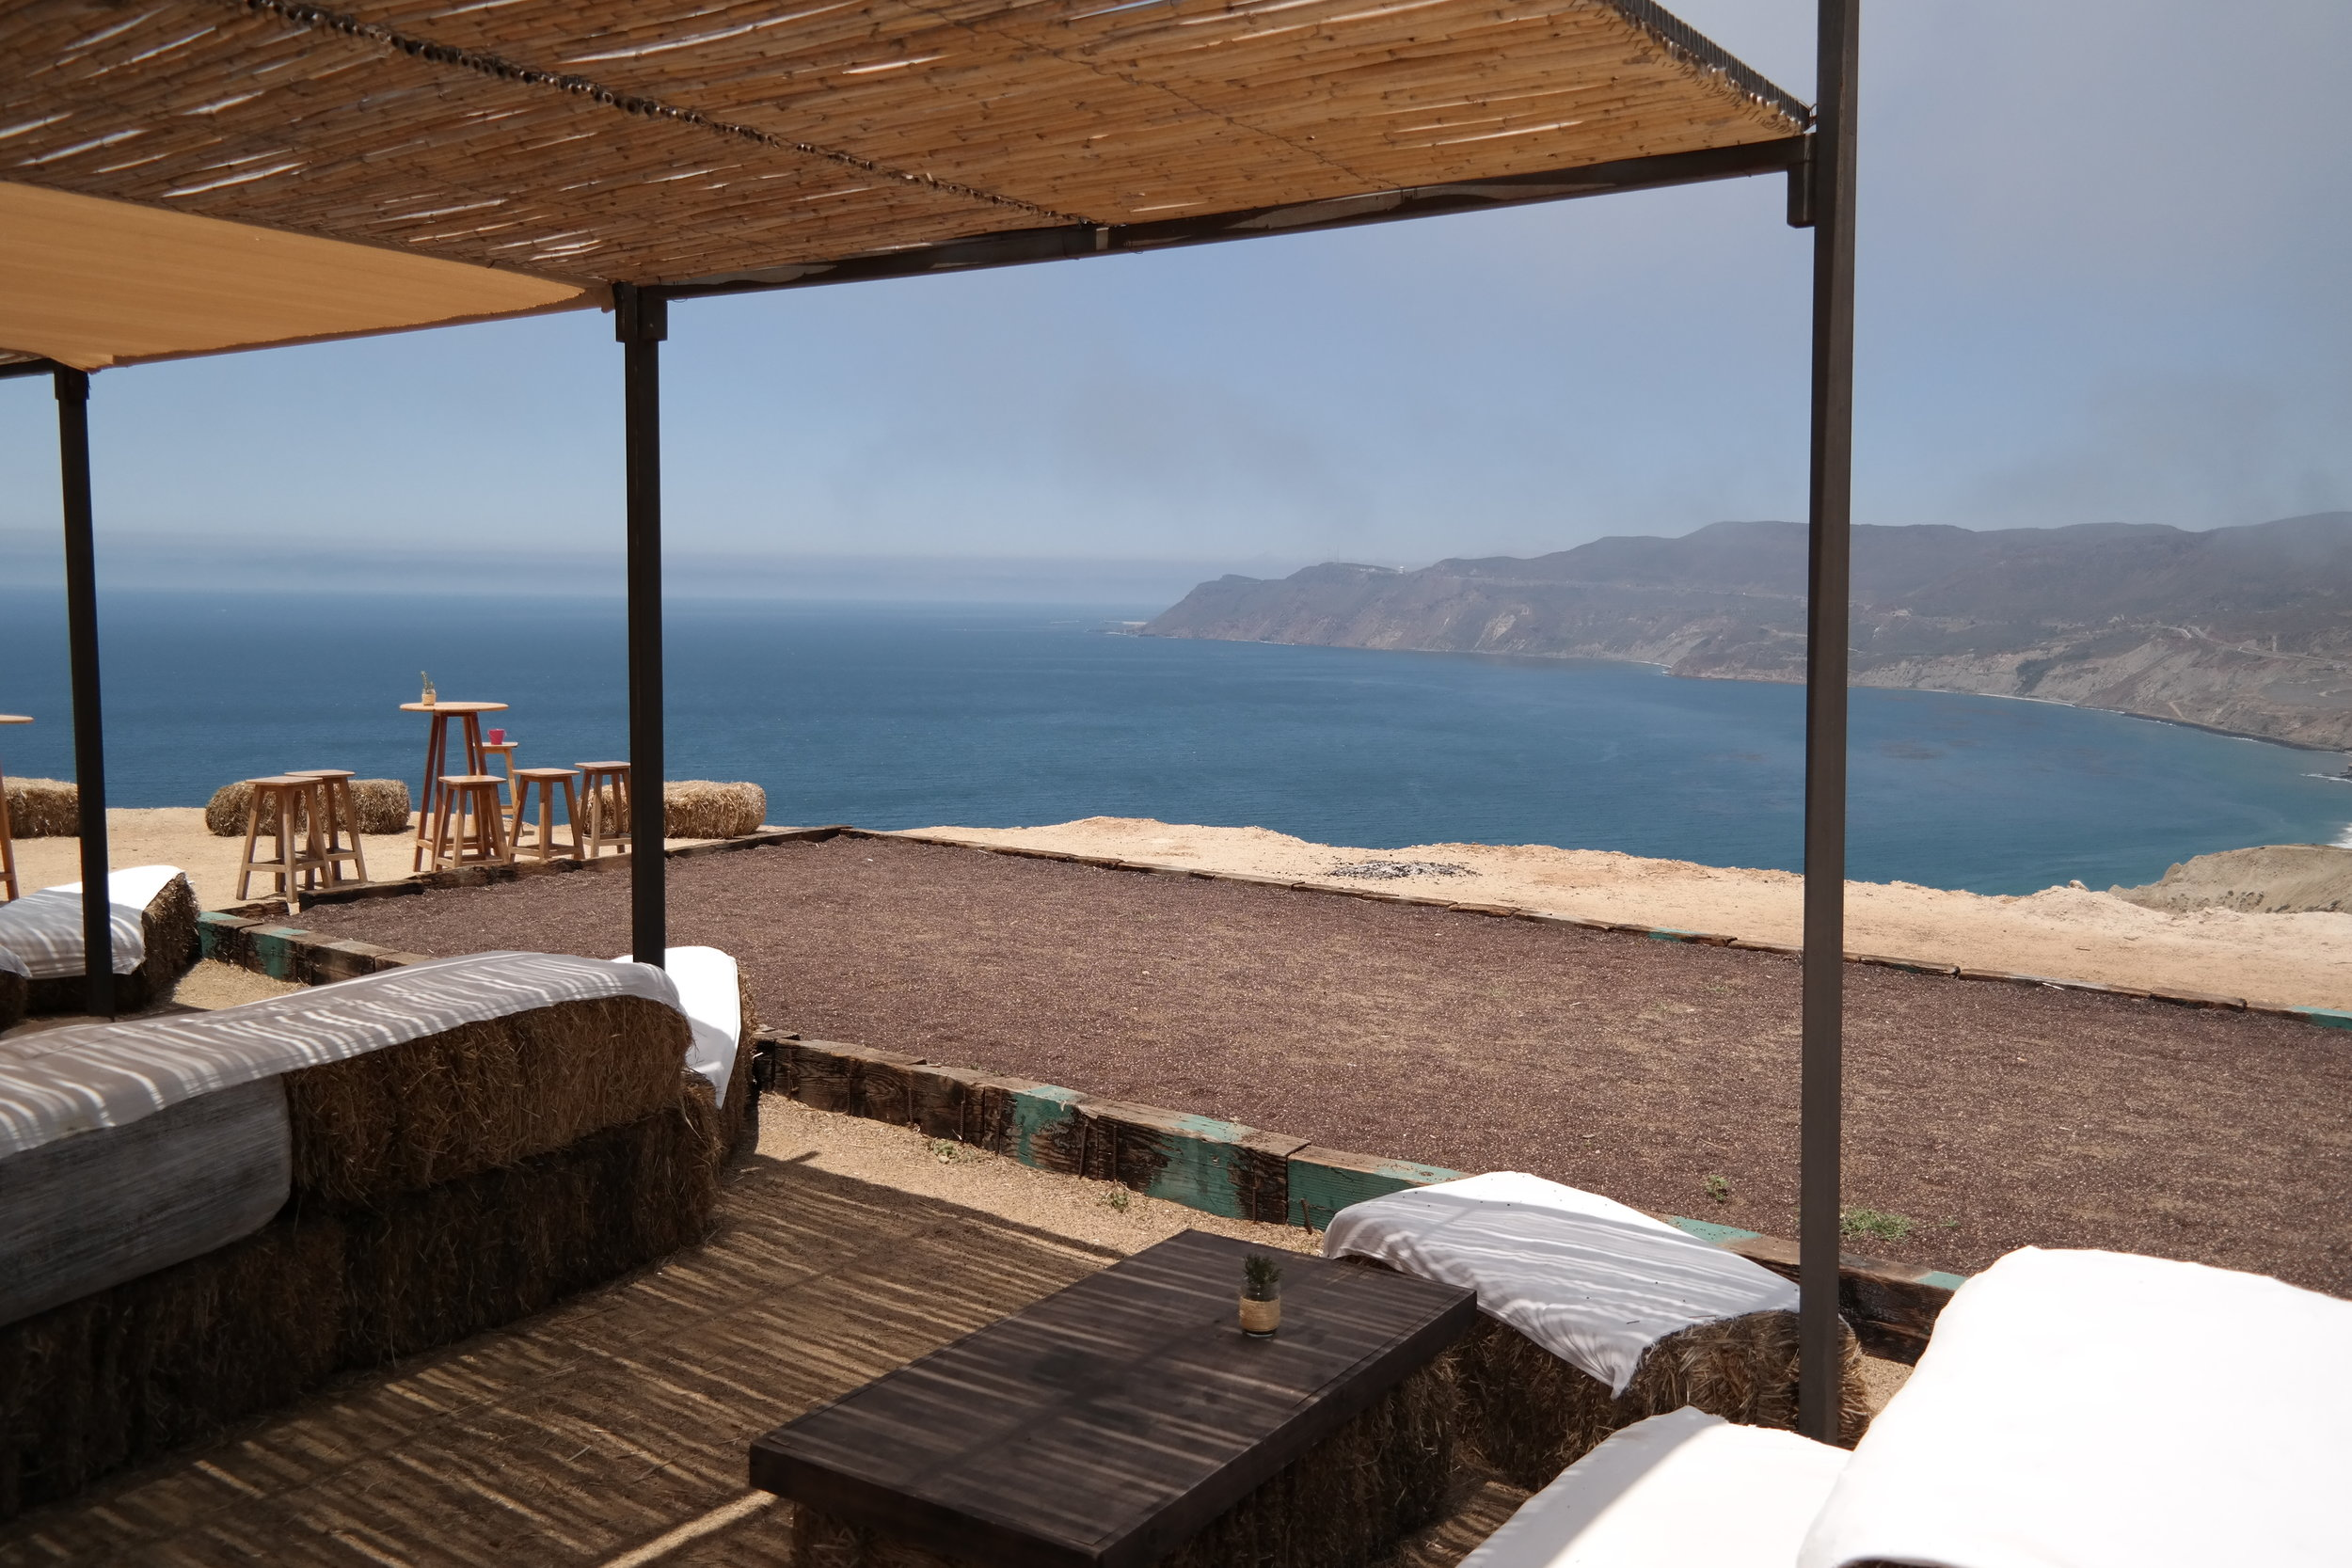 The most insane views of the Baja California Coastline from Cuatro Cuatros Ensenada Mexico